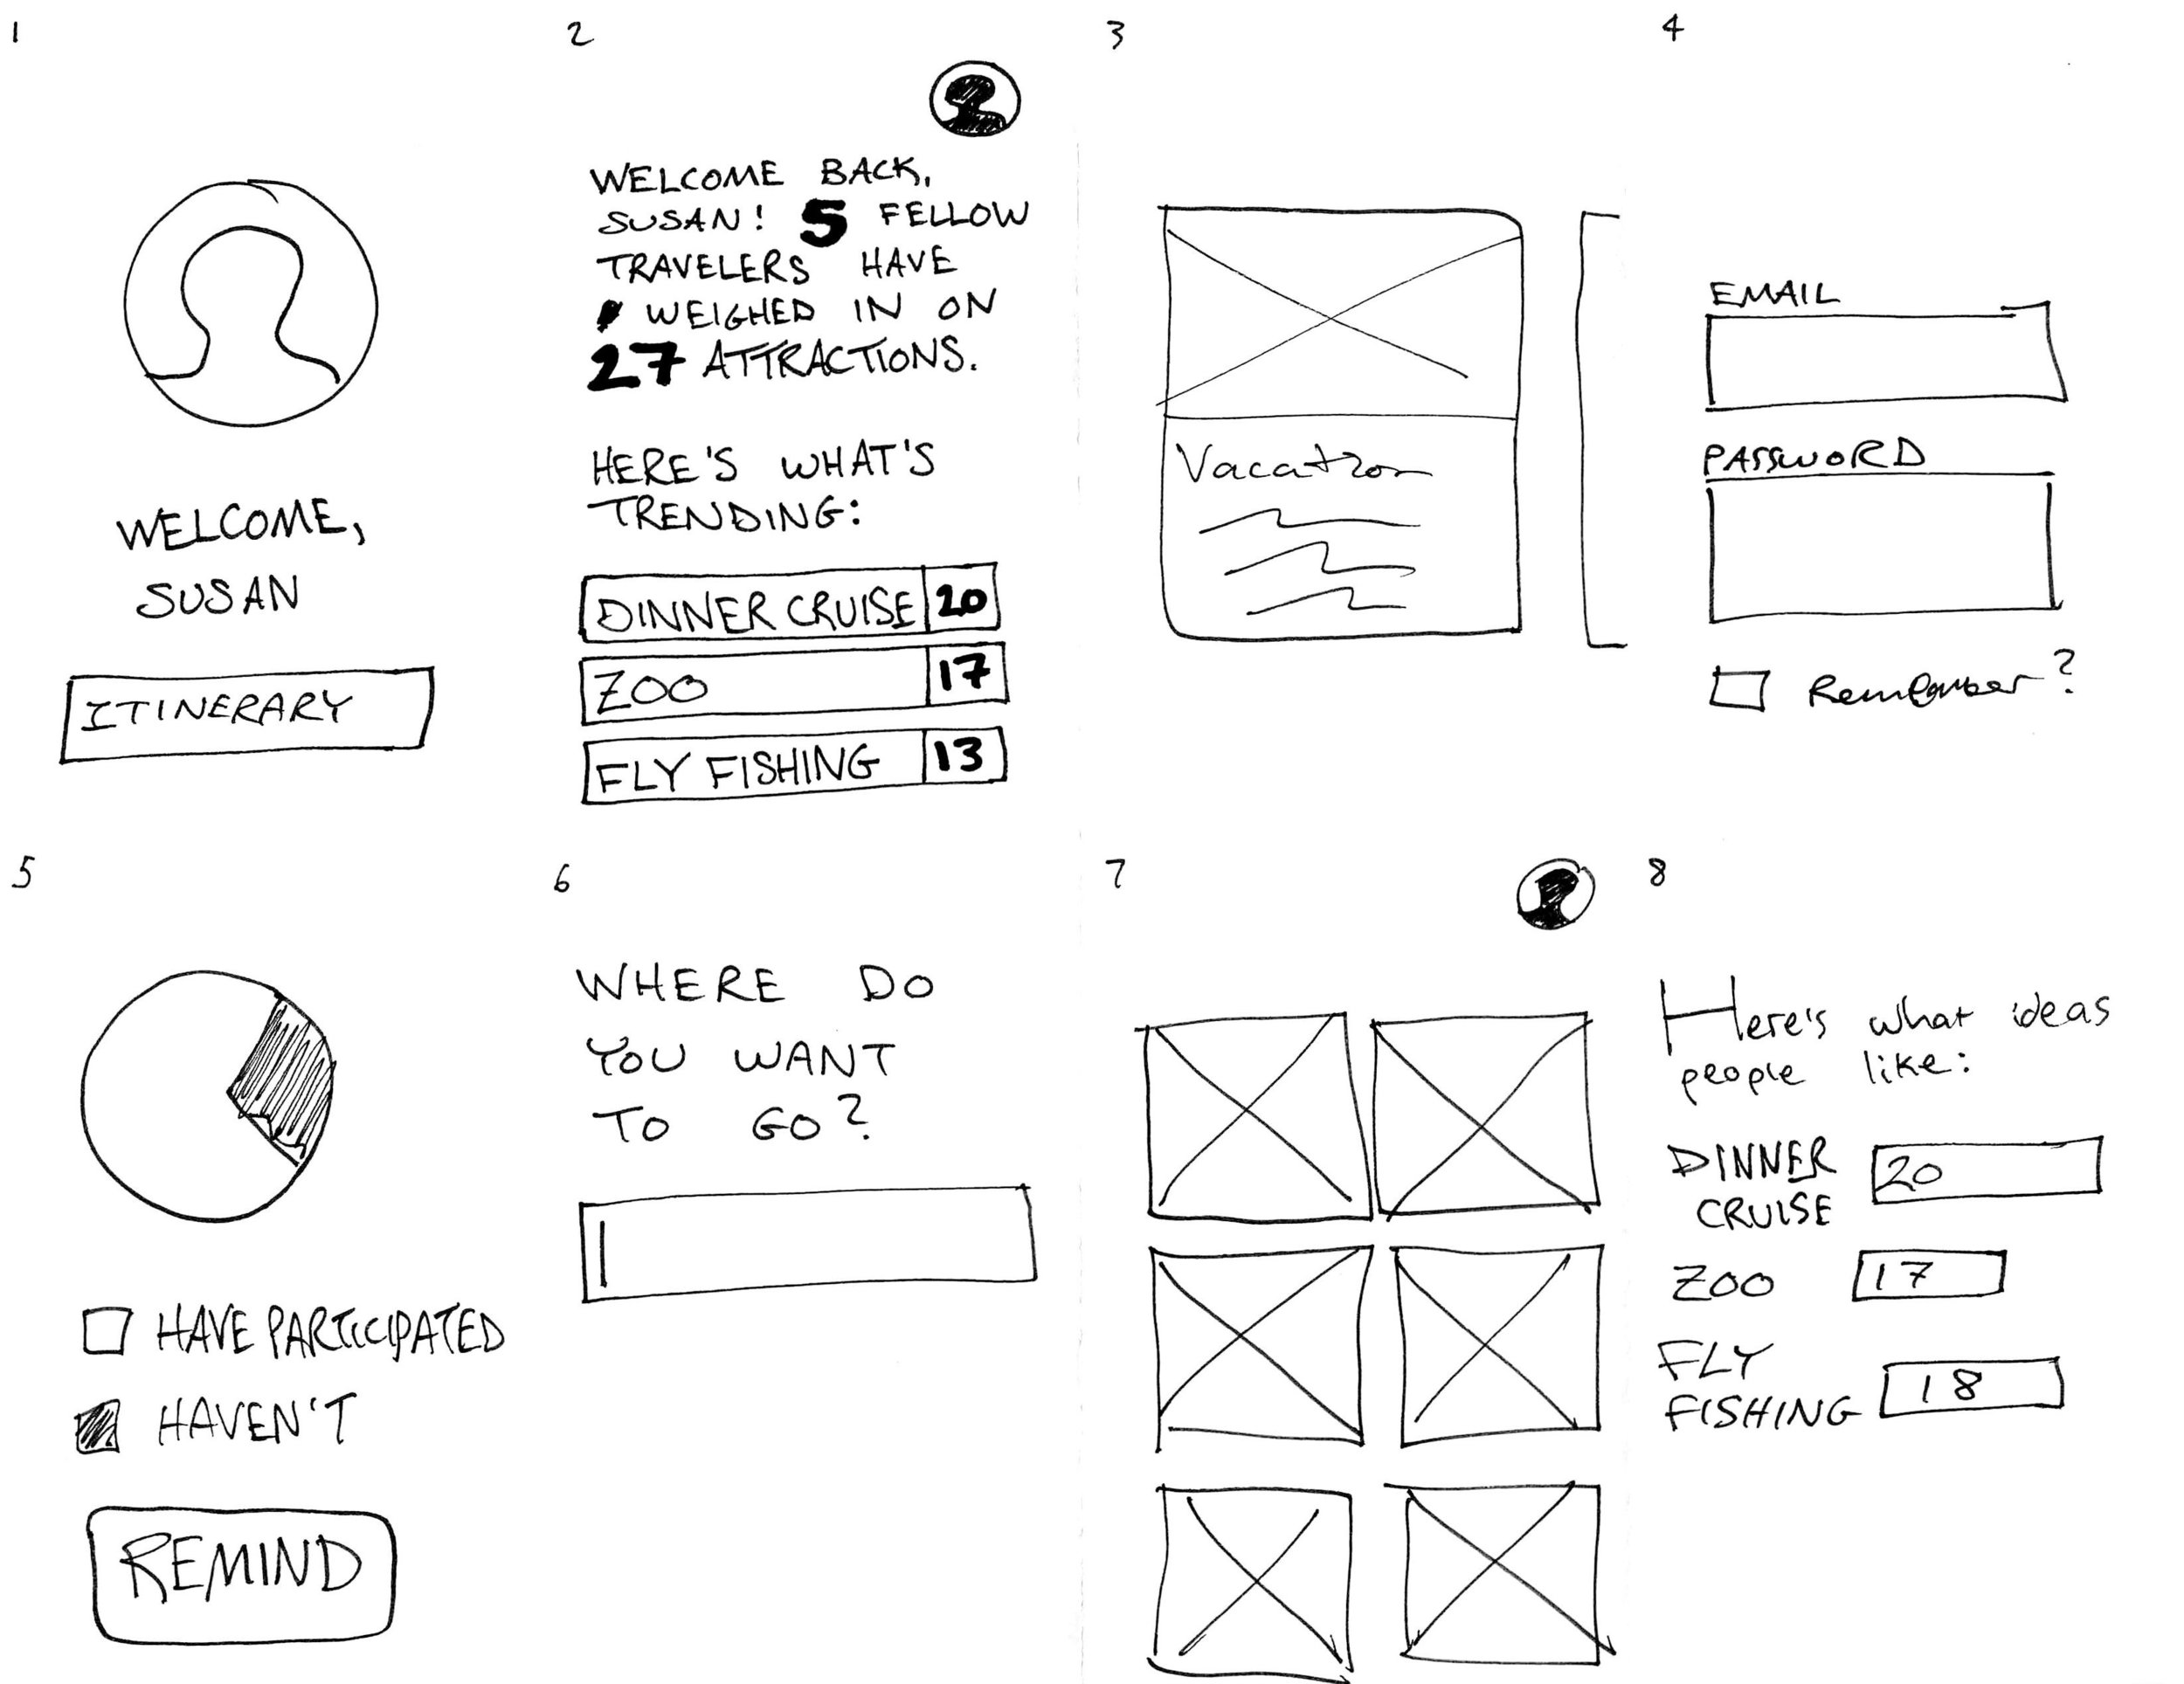 6-8-5 Sketches 1 (NL).jpg